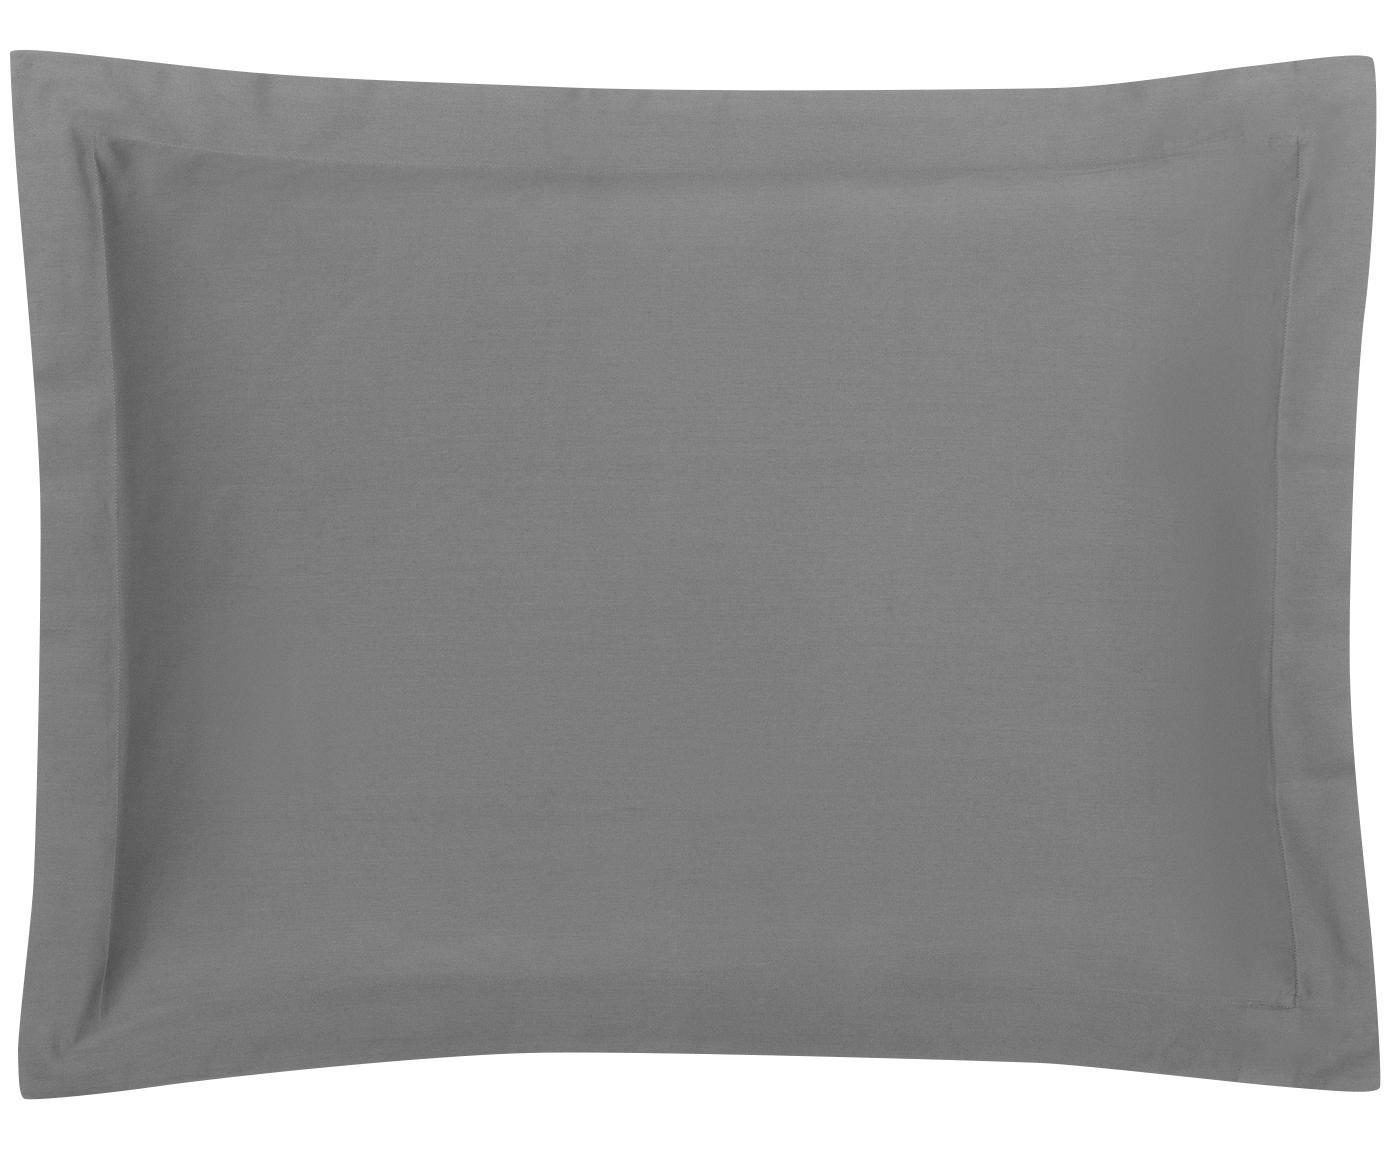 Funda de almohada de satén Premium, Gris oscuro, An 50 x L 70 cm